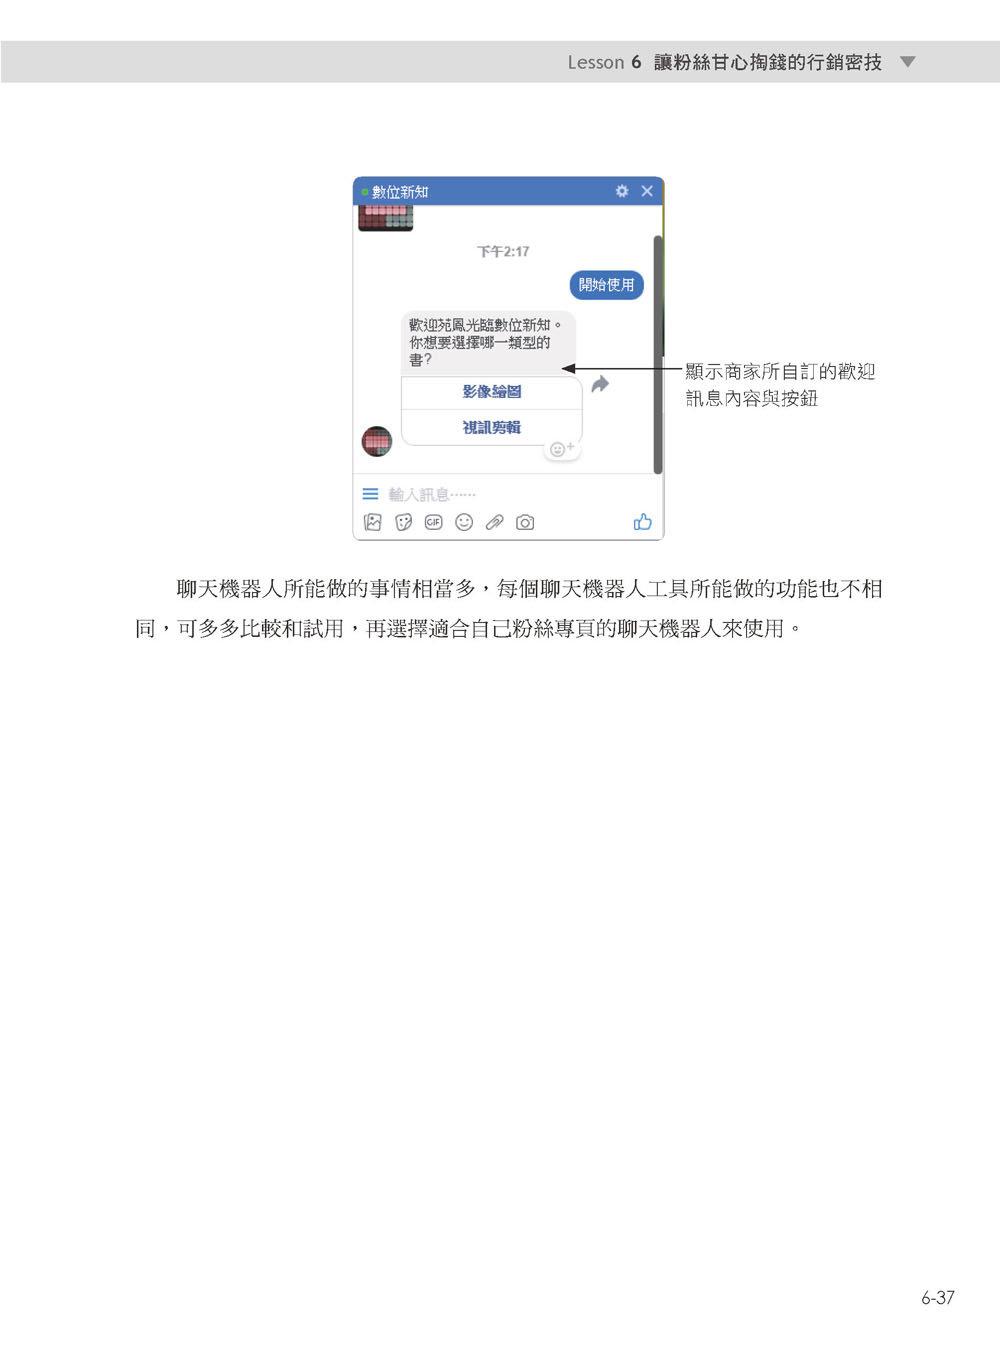 Facebook 互動行銷:社群口碑經營新思路+廣告投放如何有成效,想做好臉書行銷,操作心法就在這!-preview-25